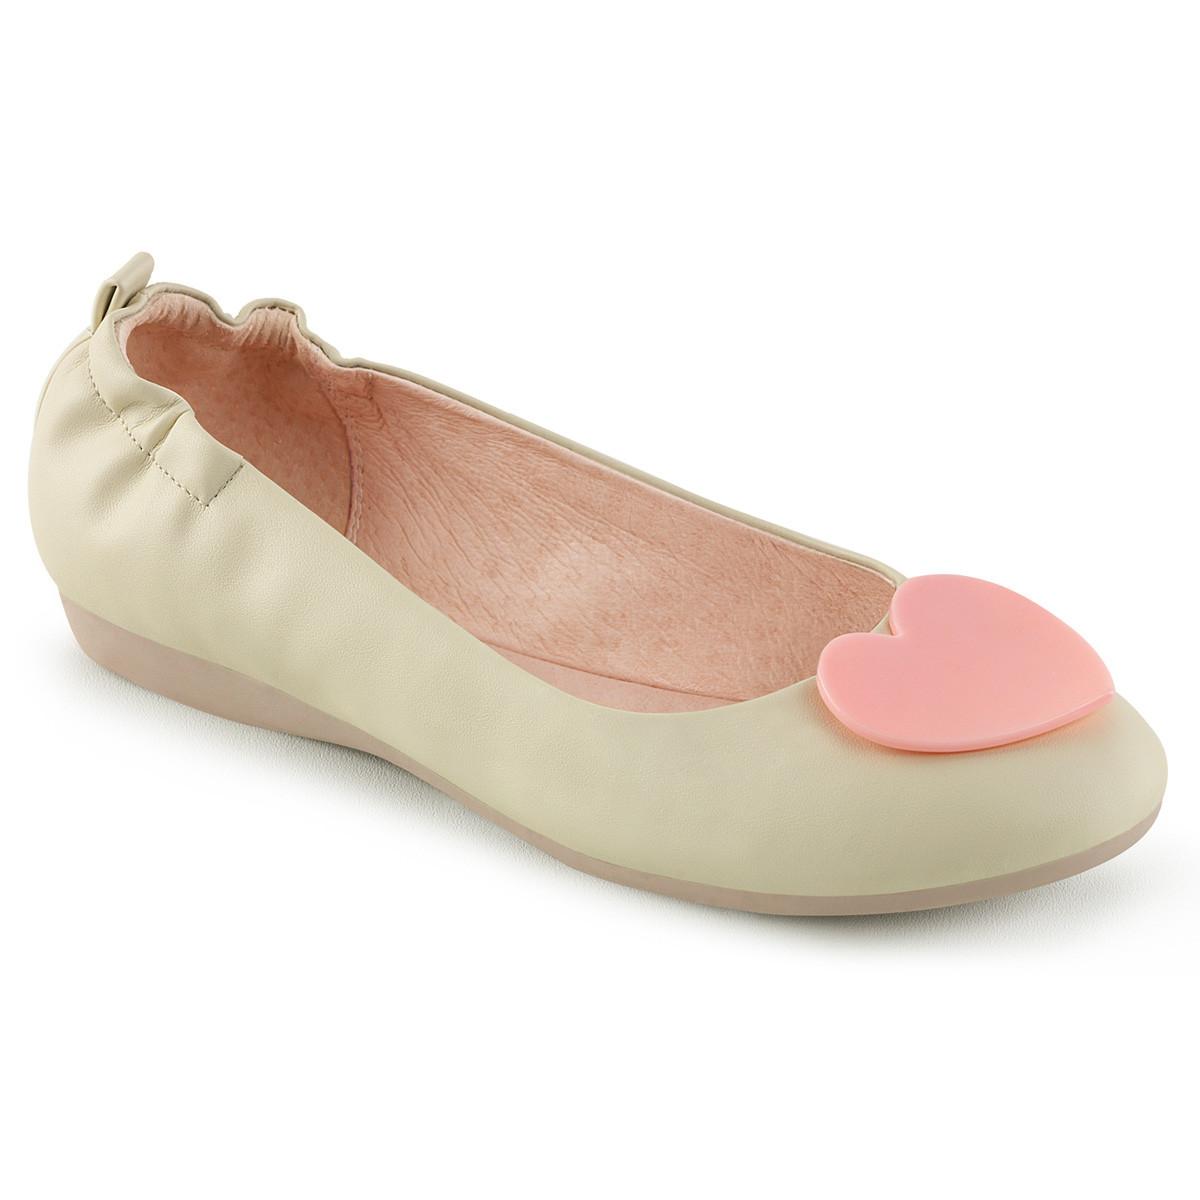 Ballerinas - OLIVE 05 ° Damen Ballerina ° Creme ° Pin Up Couture  - Onlineshop RedSixty